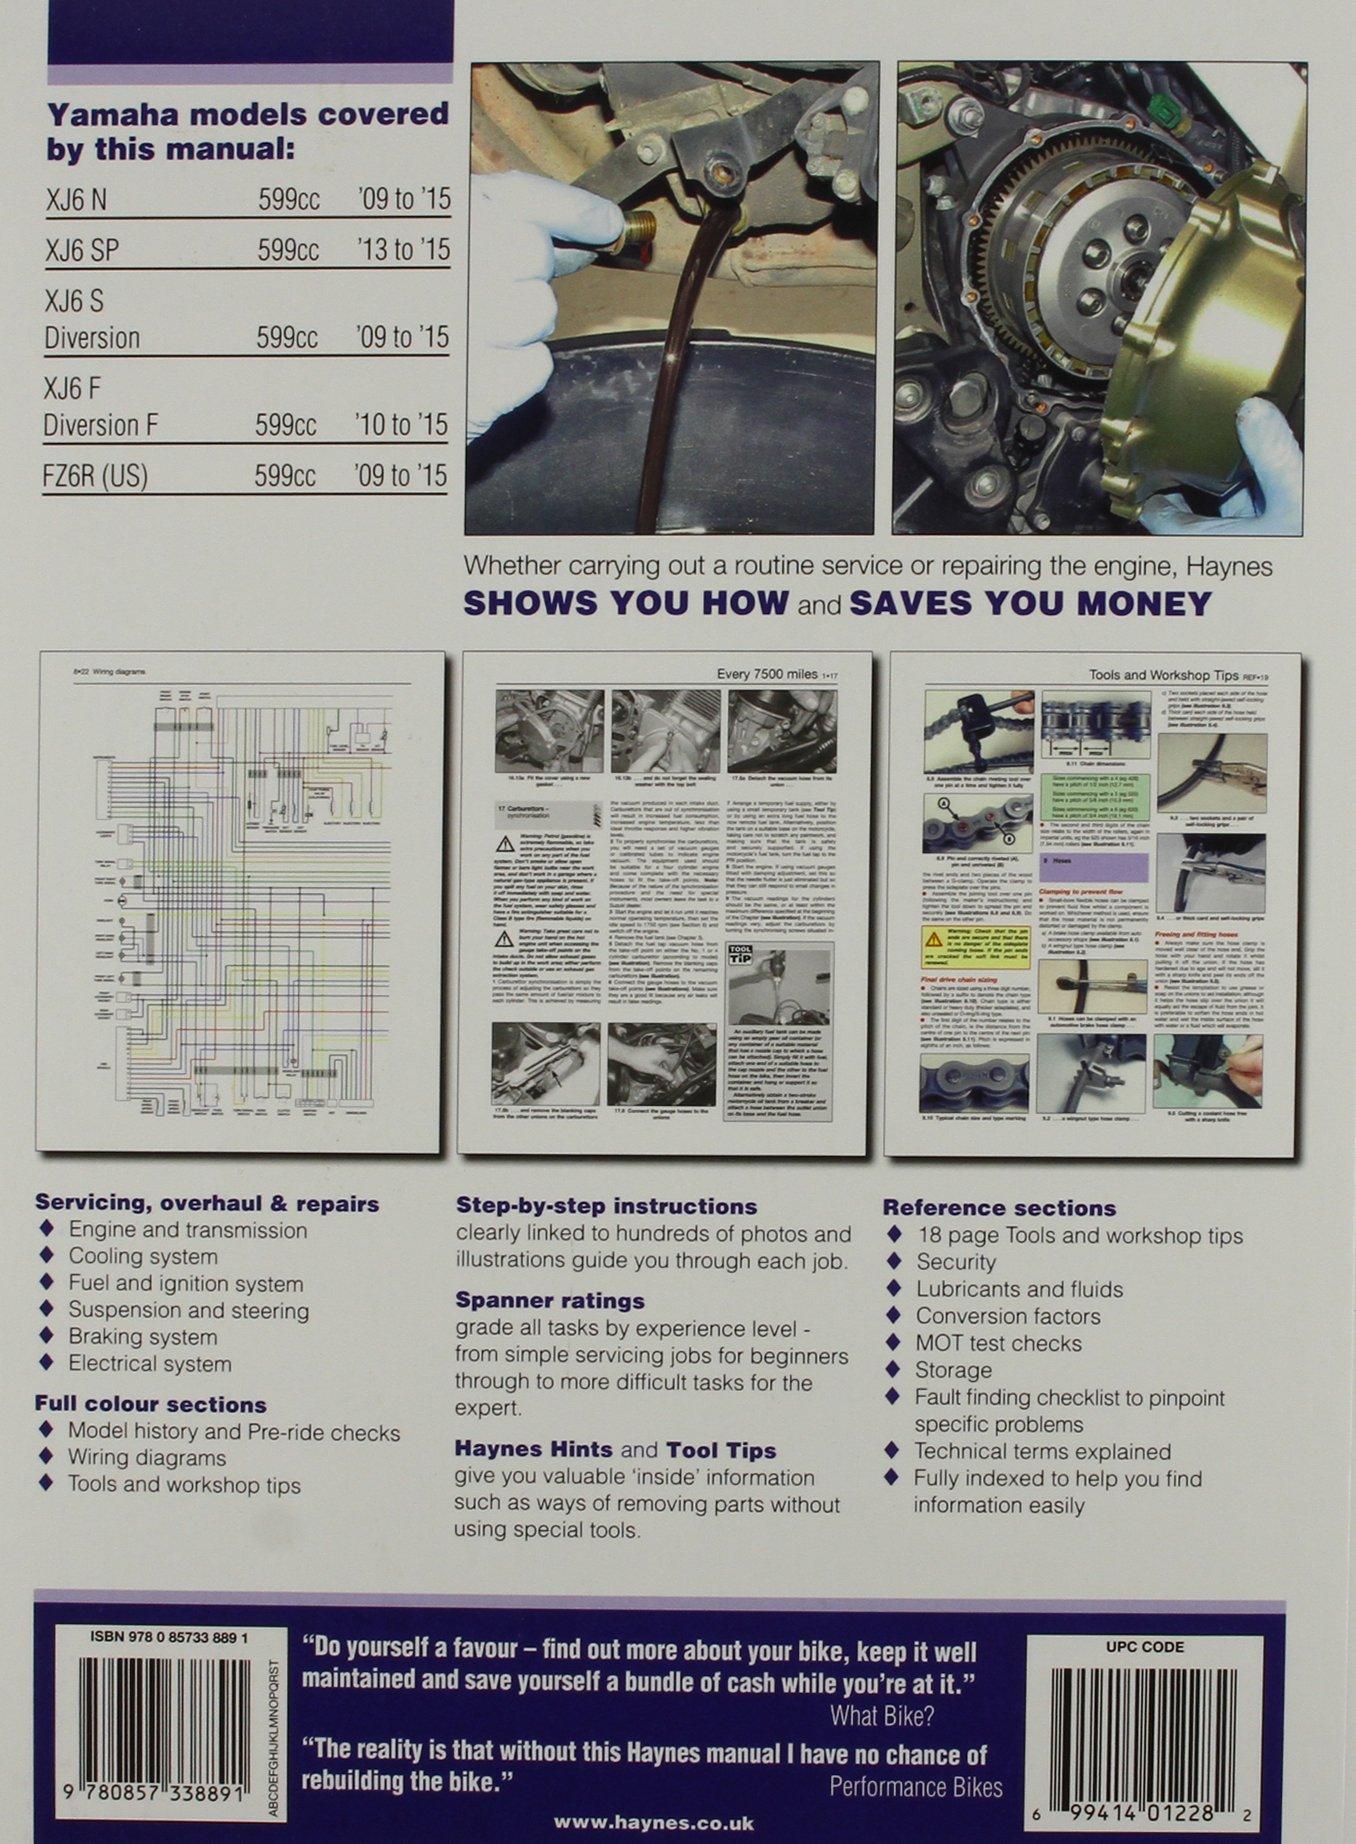 Yamaha Xj6 Fz6r Haynes Powersport Anon Wiring Diagram 9780857338891 Books